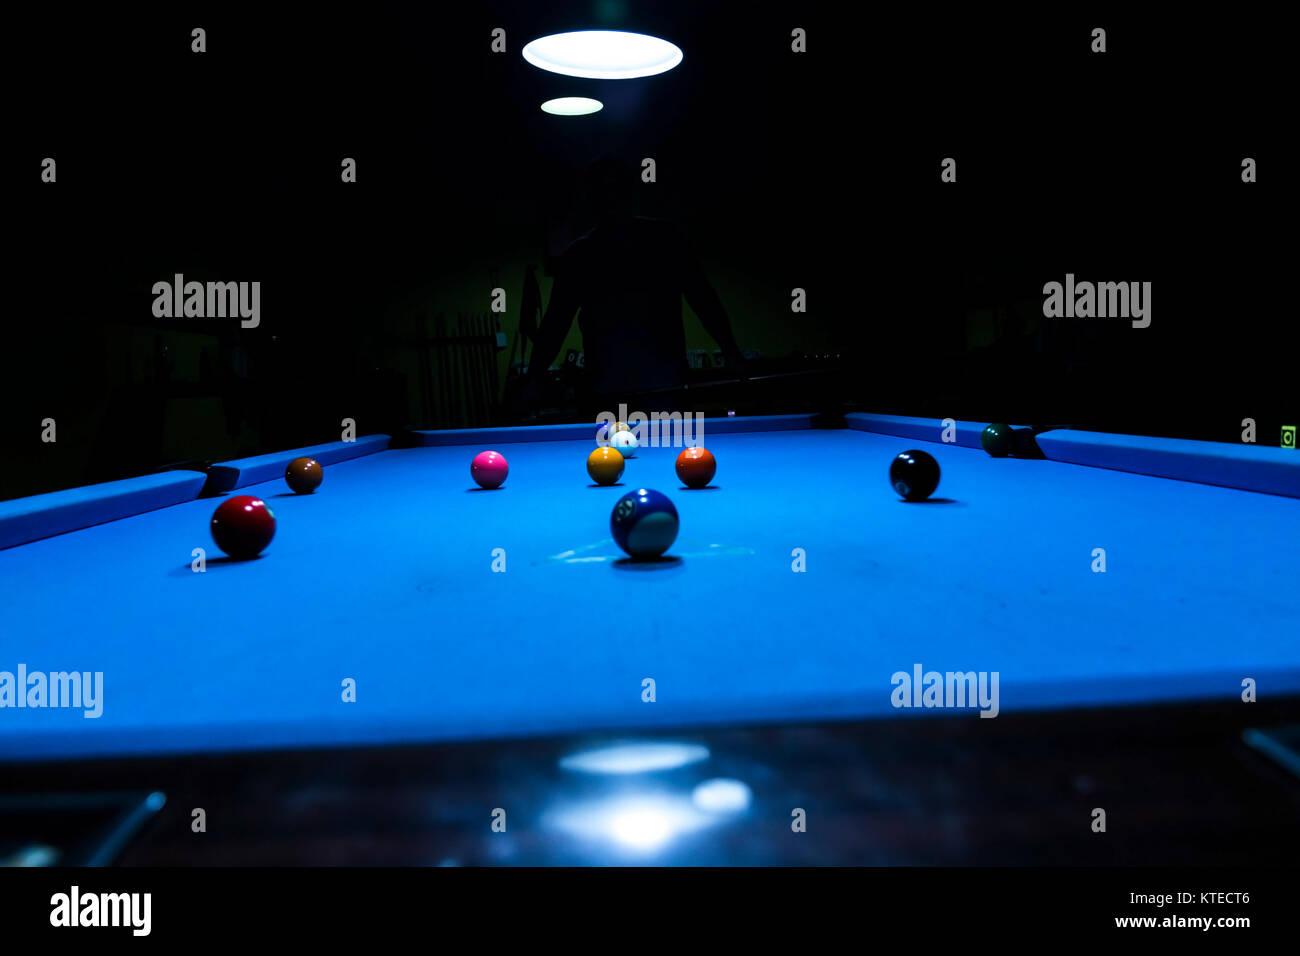 Initial kick at the billiard pool table - Stock Image